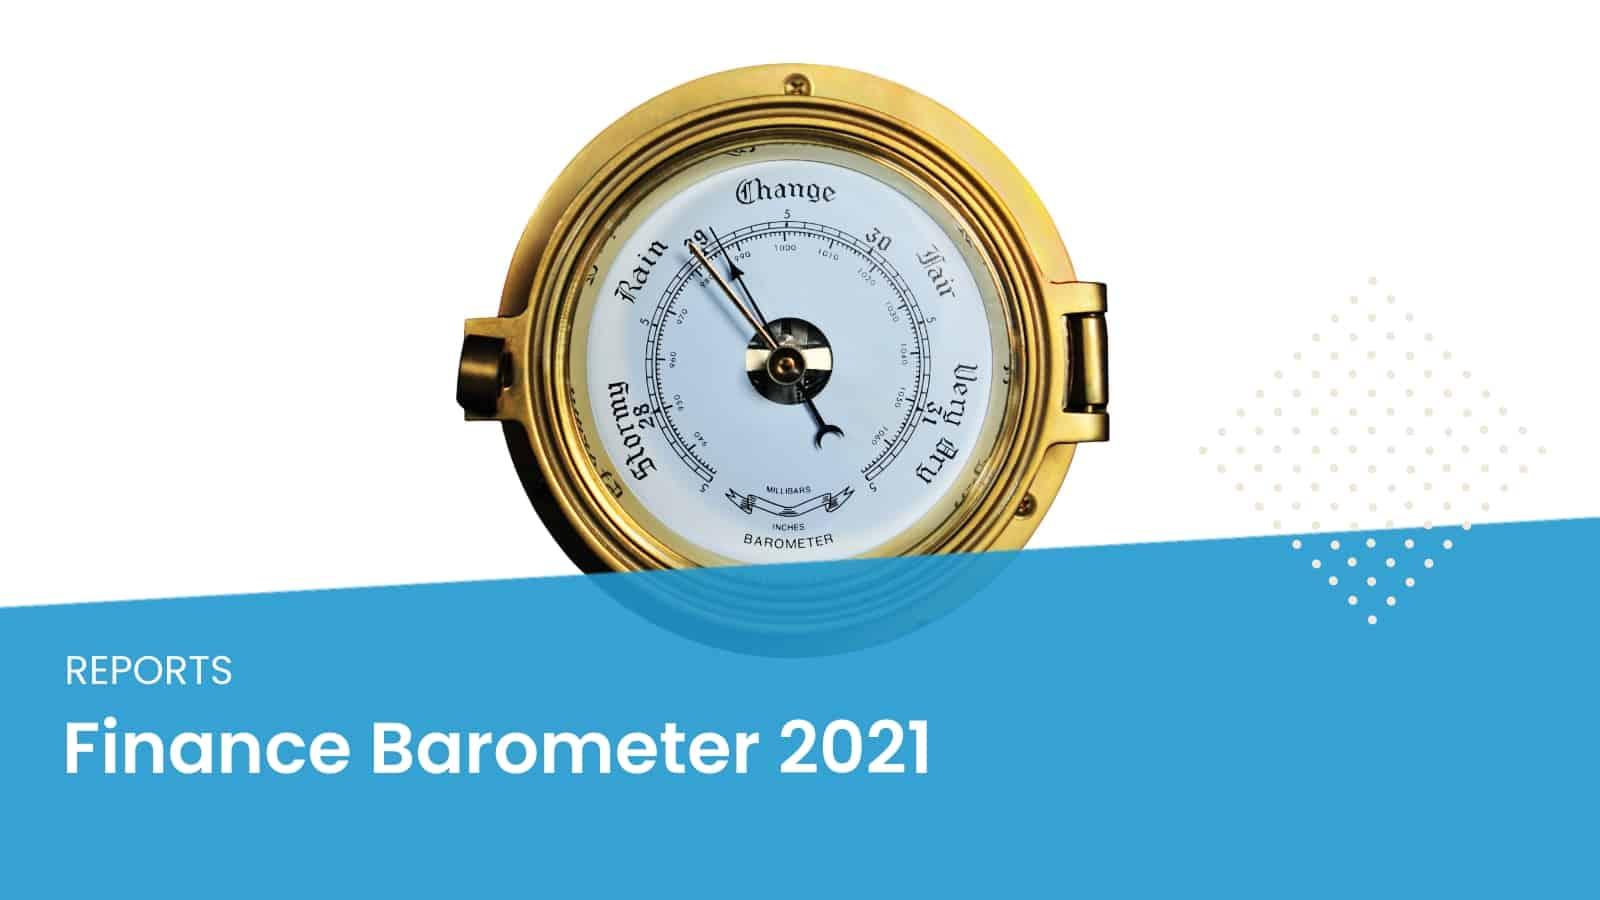 Finance Barometer 2021 Credit Report Loan Statistics